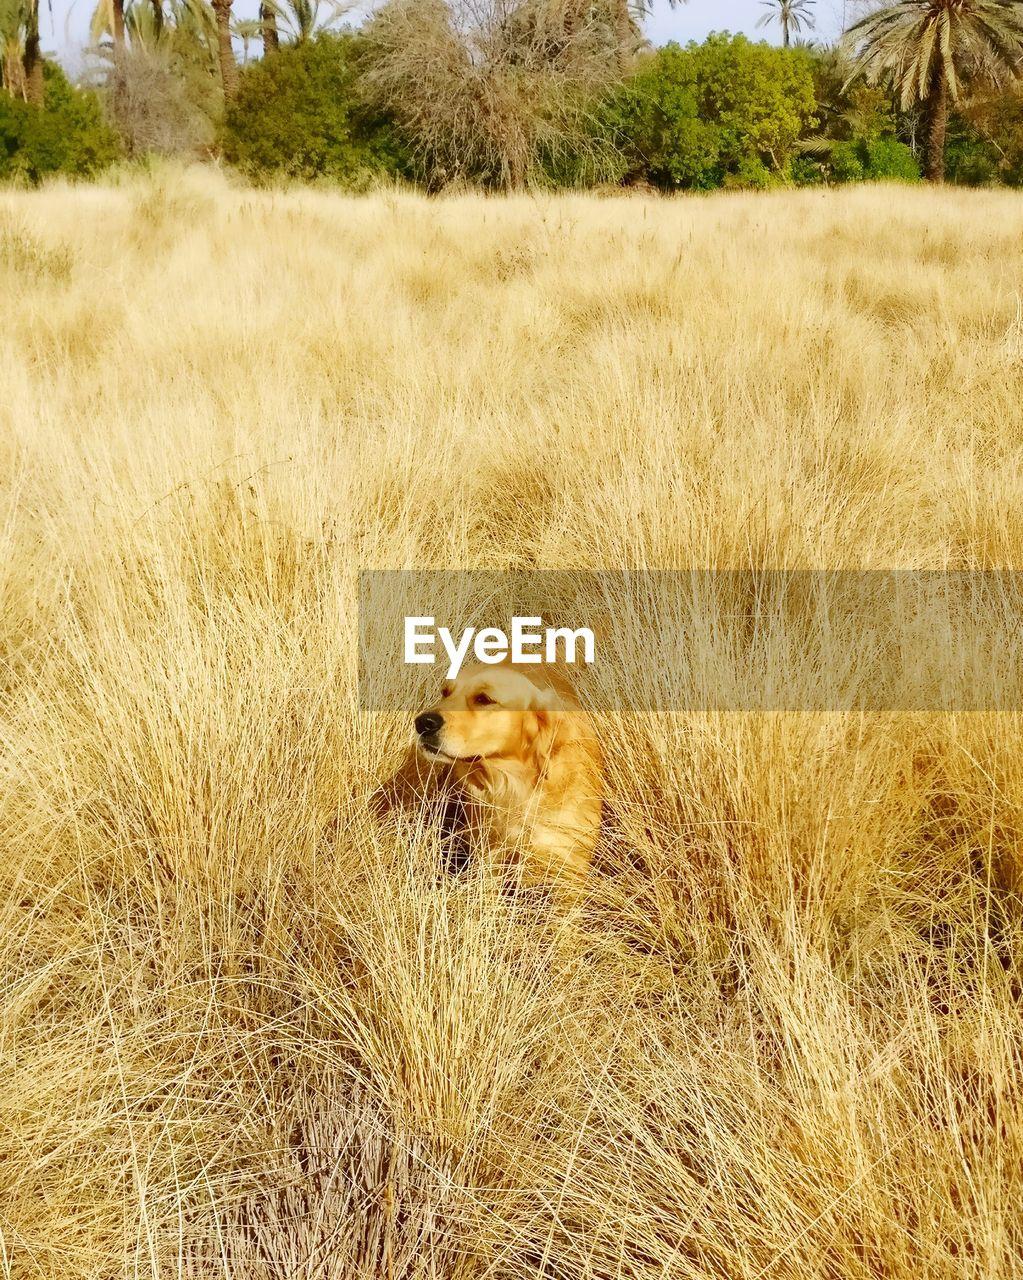 grass, plant, animal, one animal, animal themes, mammal, land, nature, field, no people, day, vertebrate, animal wildlife, pets, feline, cat, animals in the wild, tree, domestic animals, lion - feline, outdoors